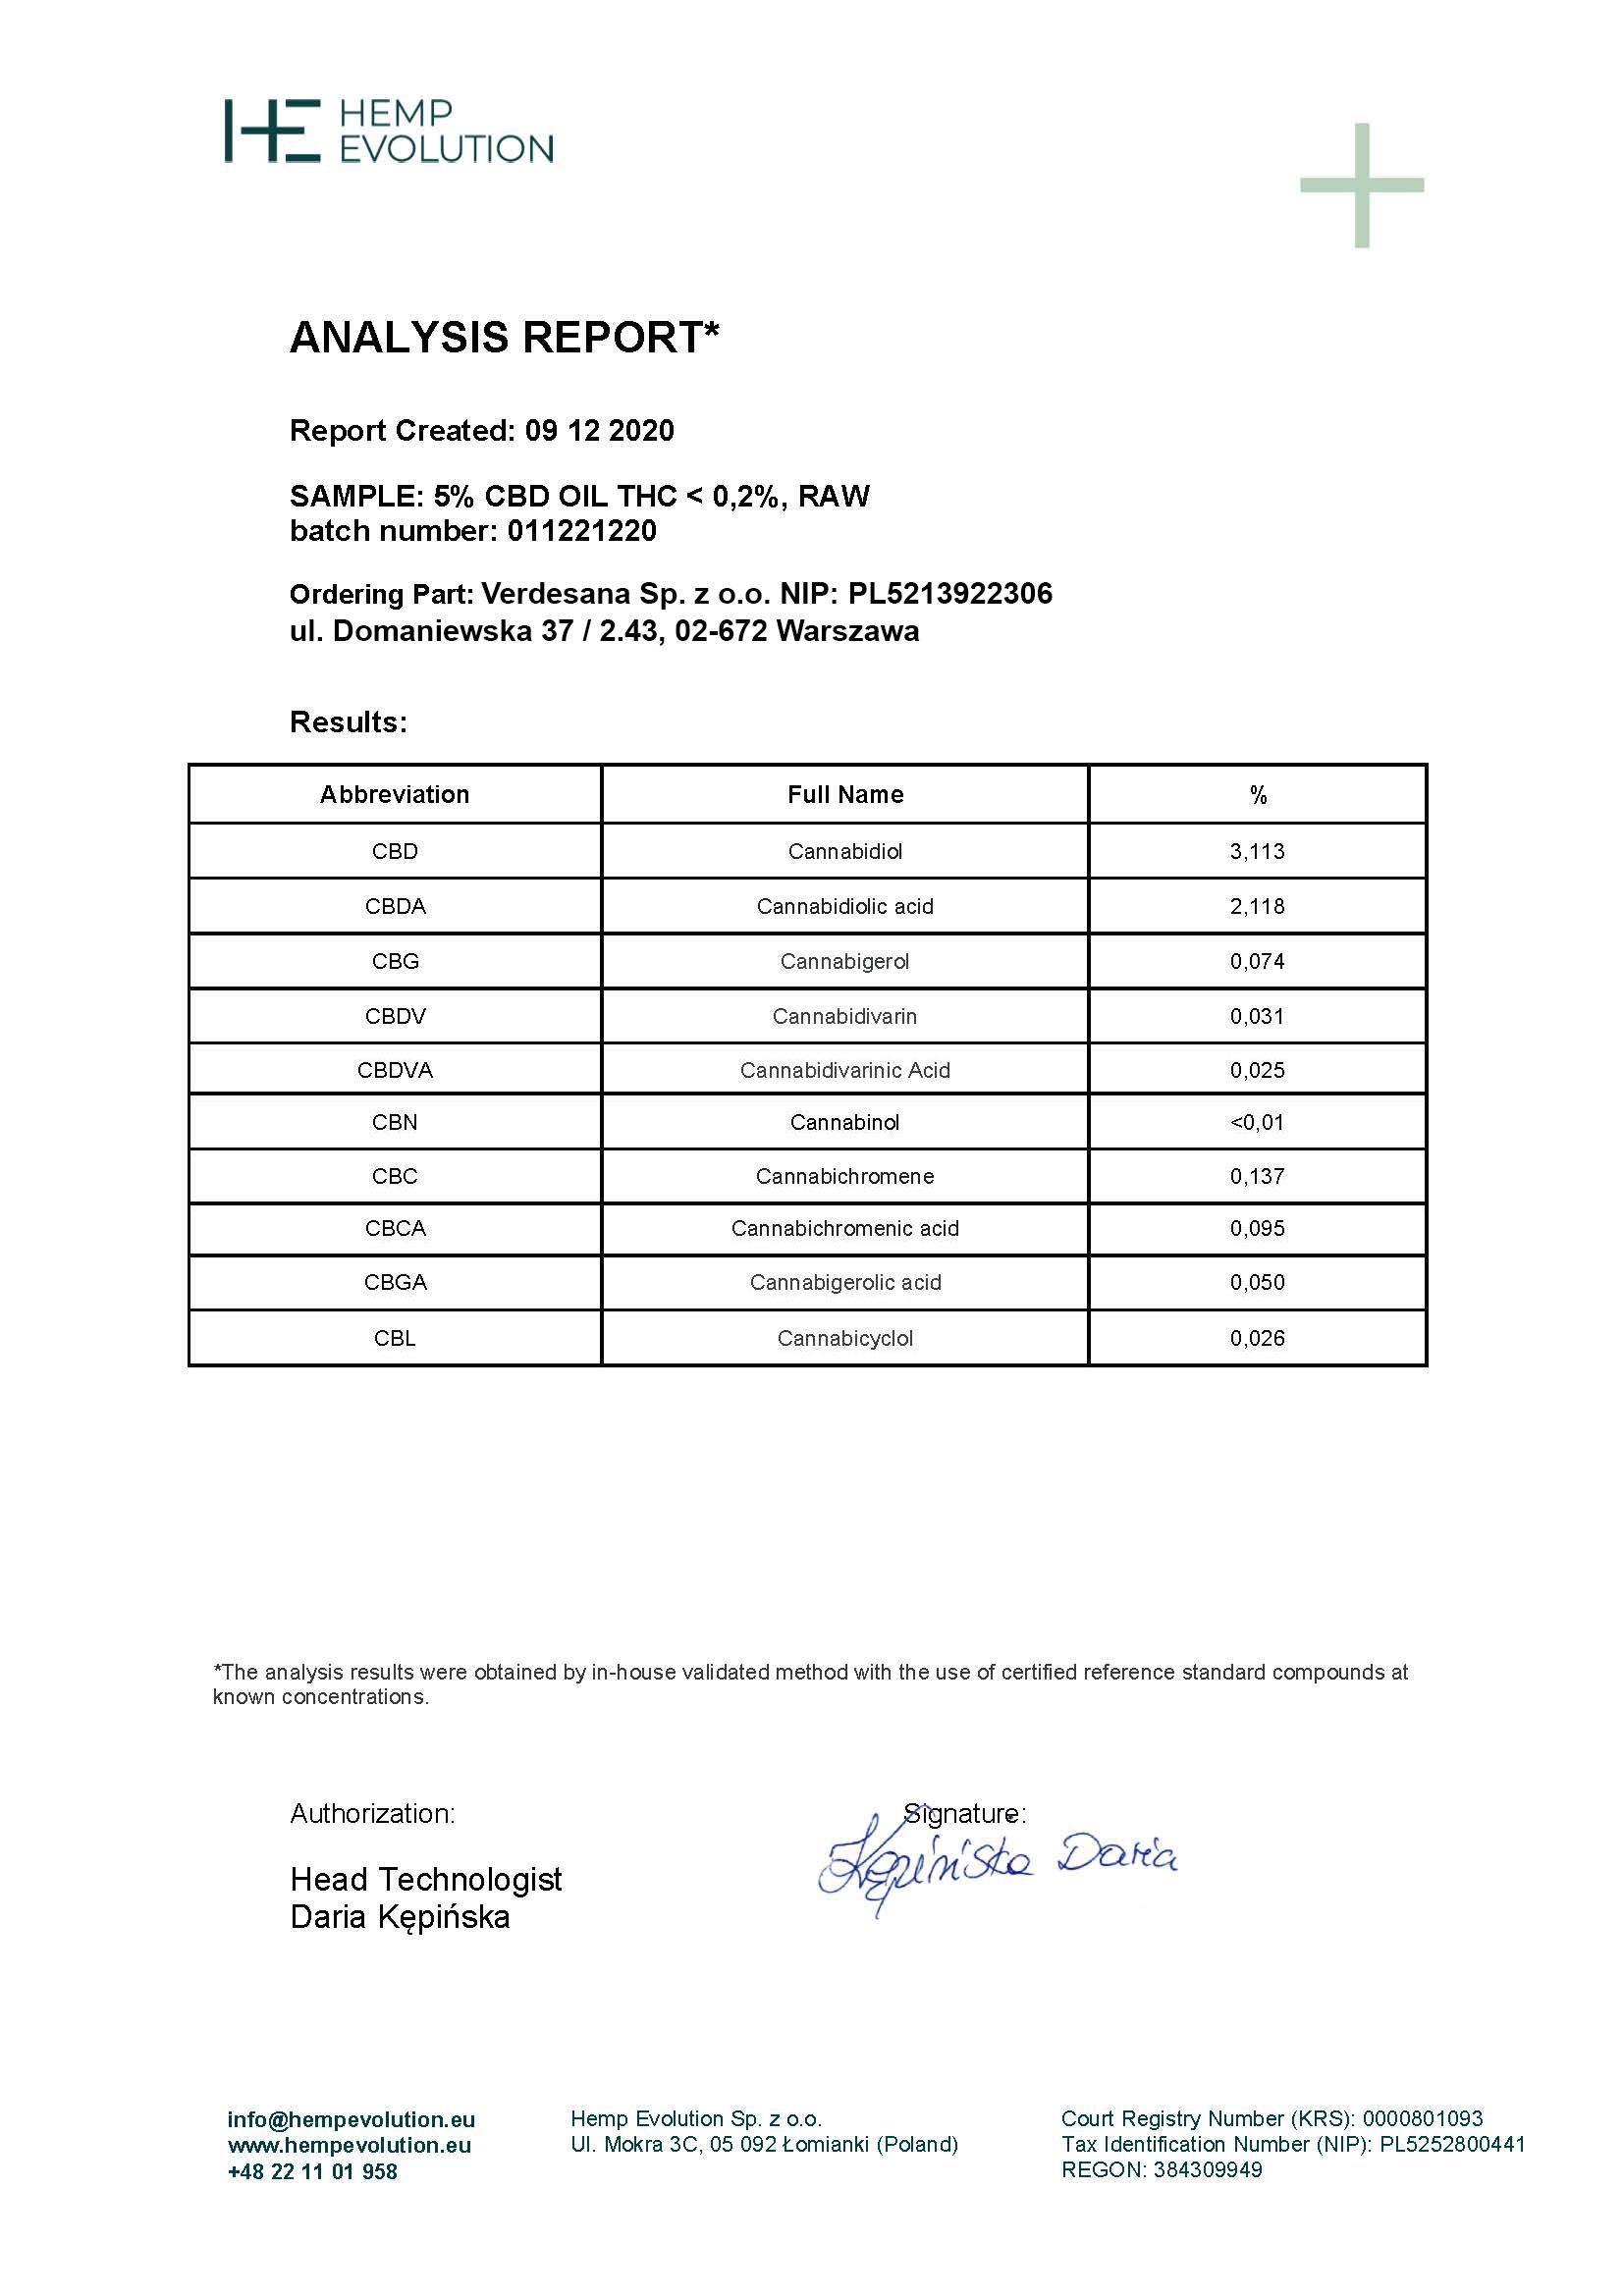 Certyfikat analizy - Verdesana Ekstrakt Konopny 5% CBD THC pon 02% RAW